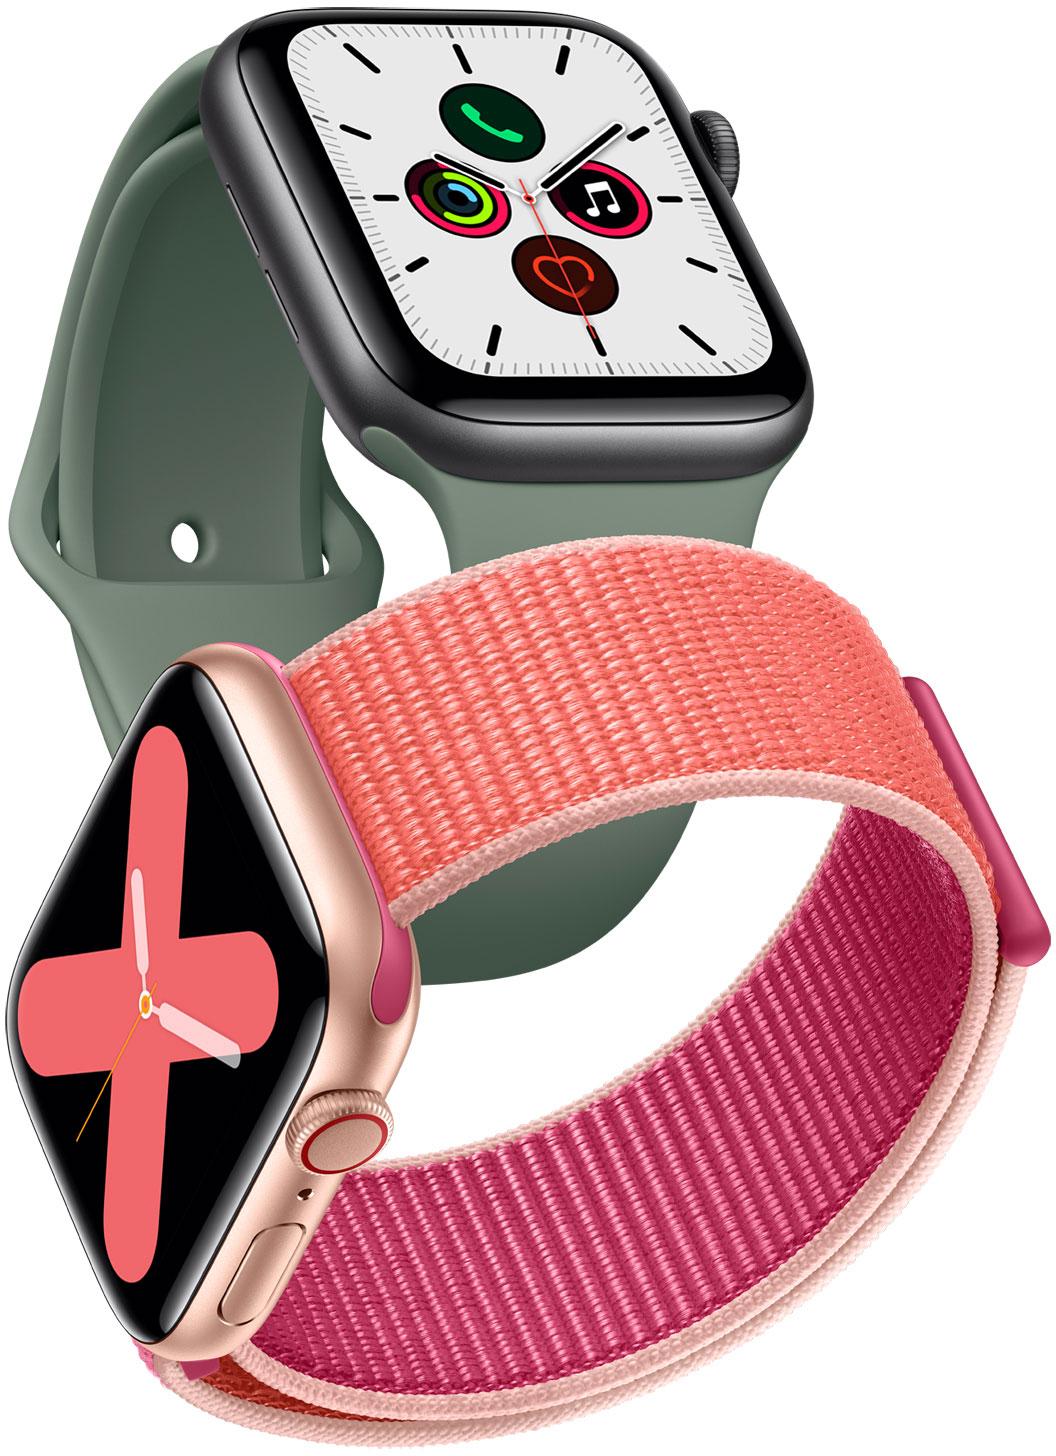 Applewatchseries5 or titane